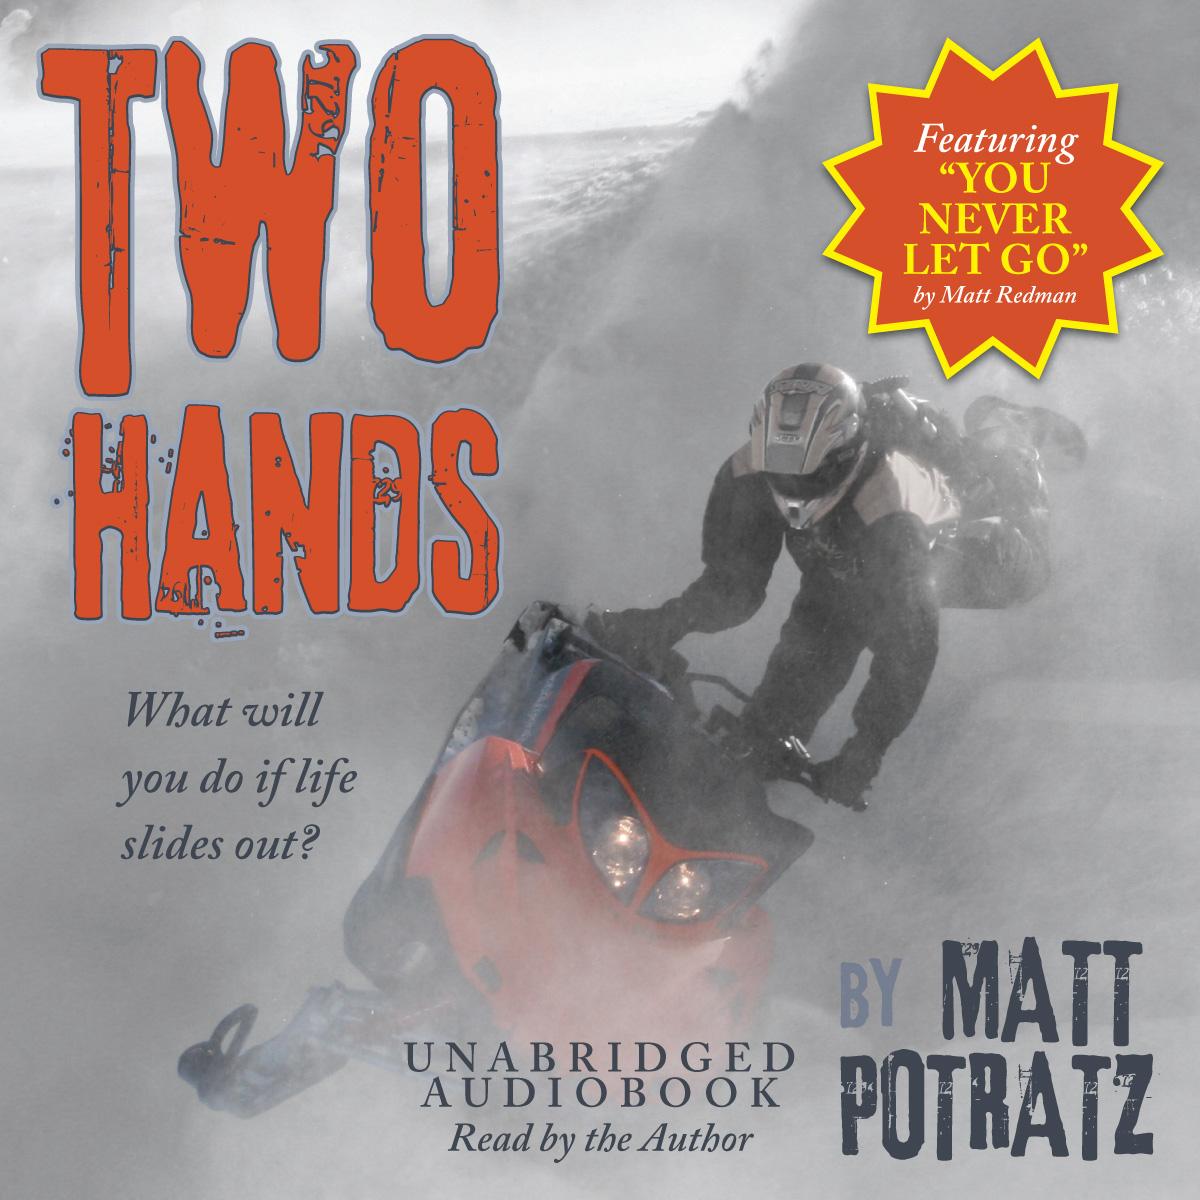 Two Hands Audiobook on iTunes